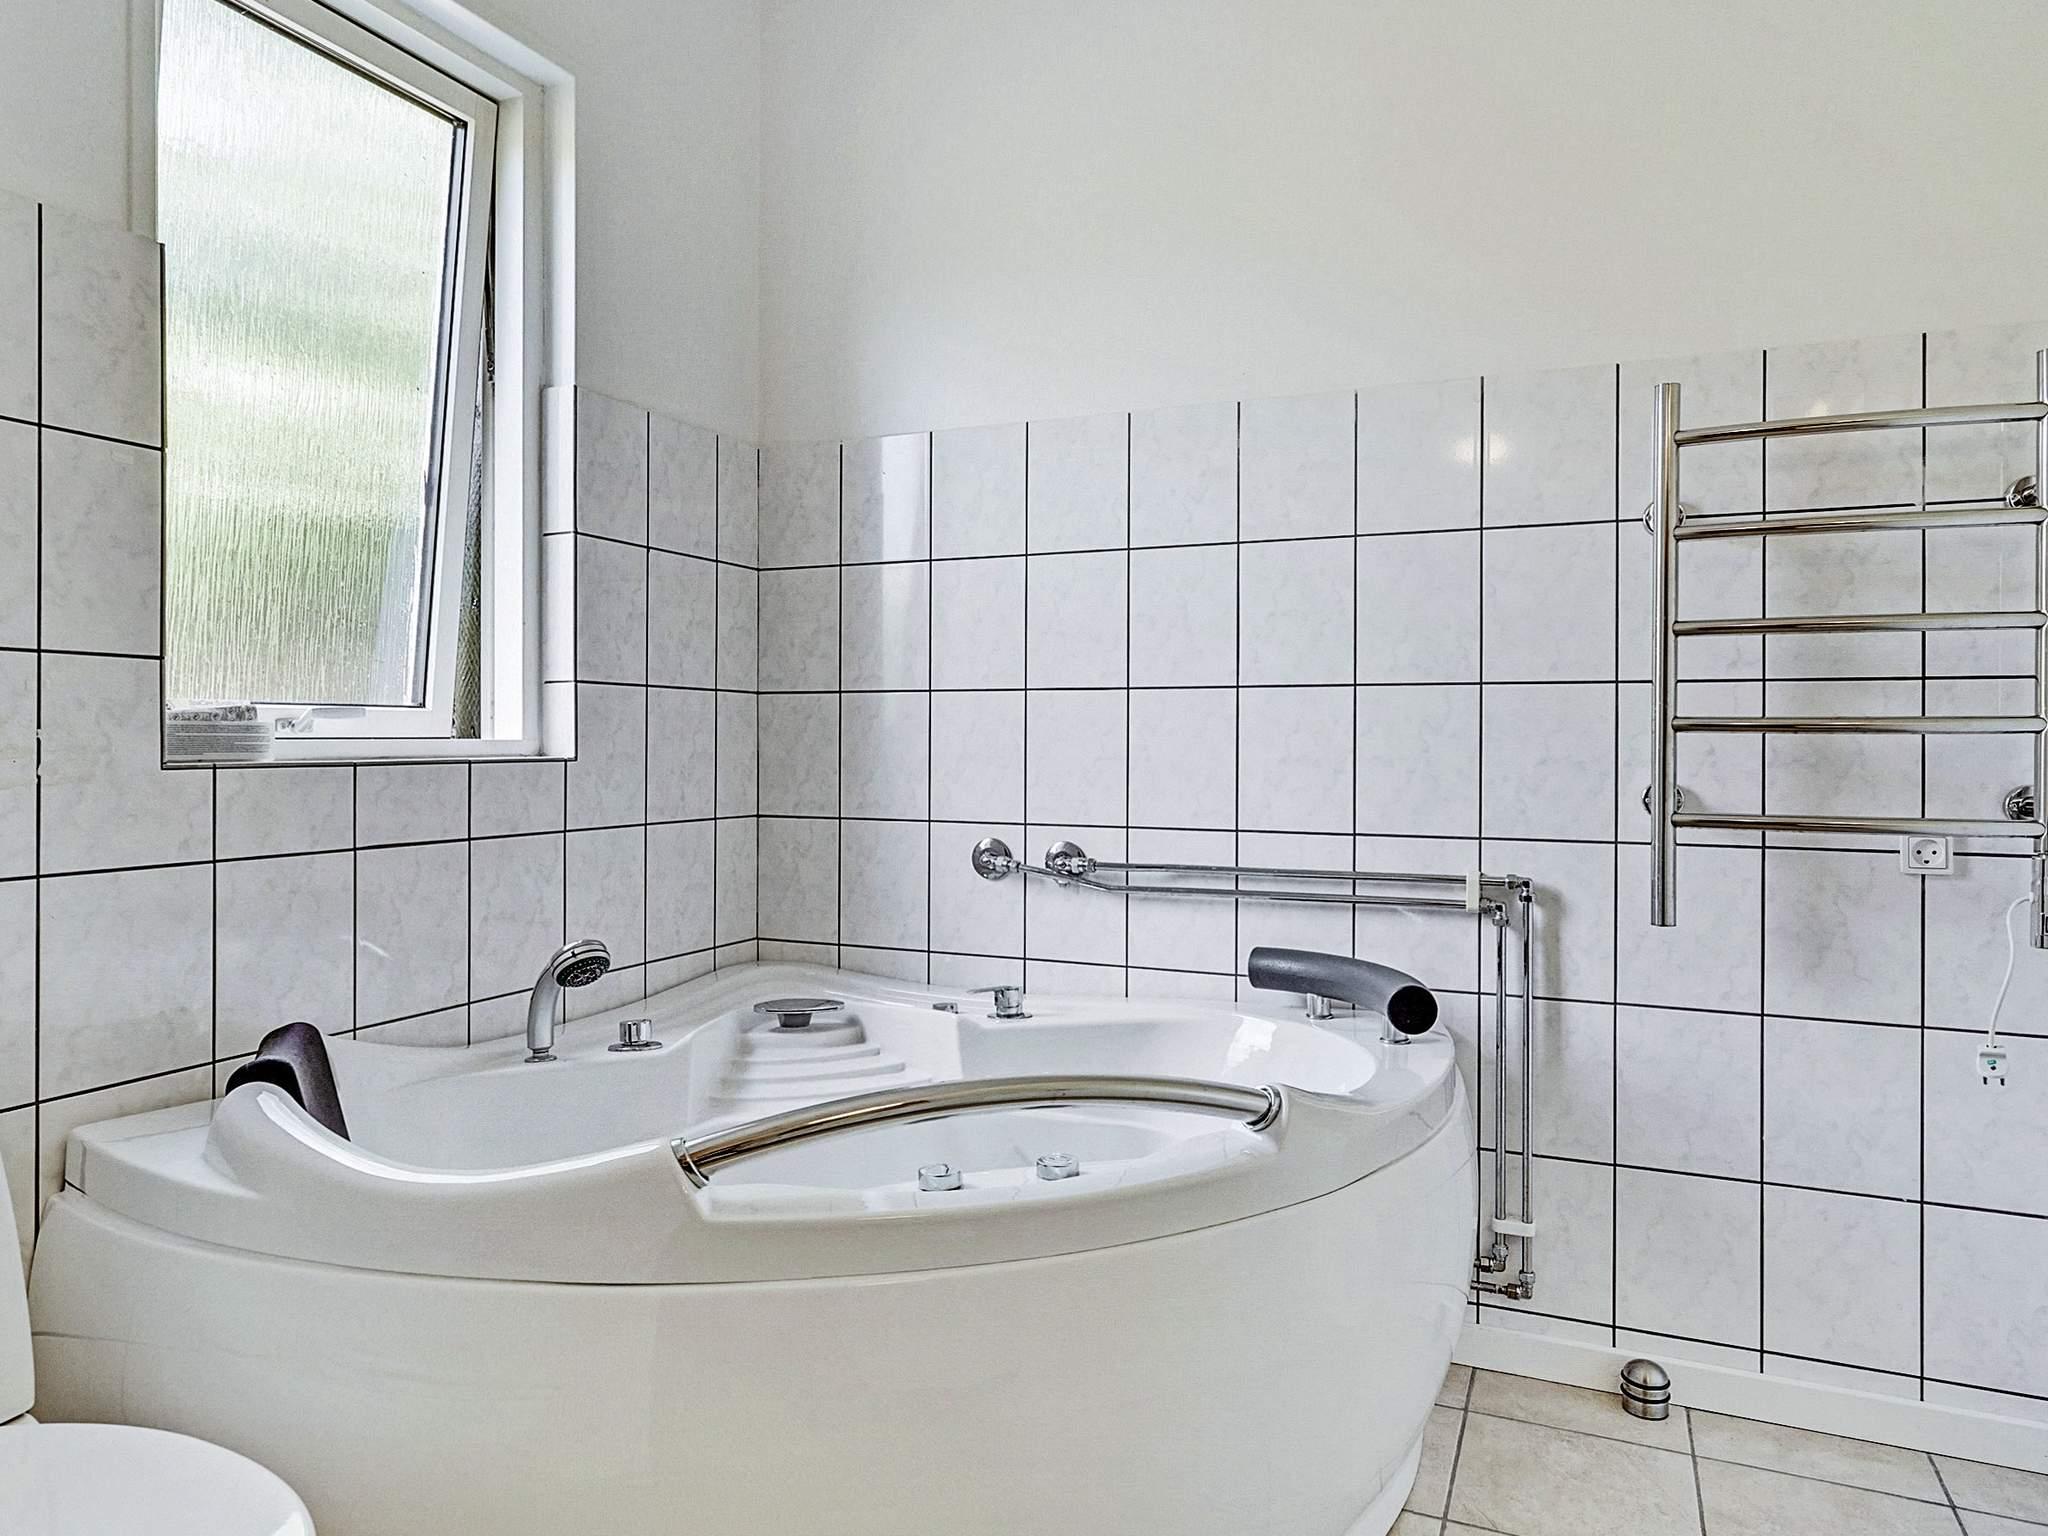 Ferienhaus Bukkemose (500812), Humble, , Langeland, Dänemark, Bild 17